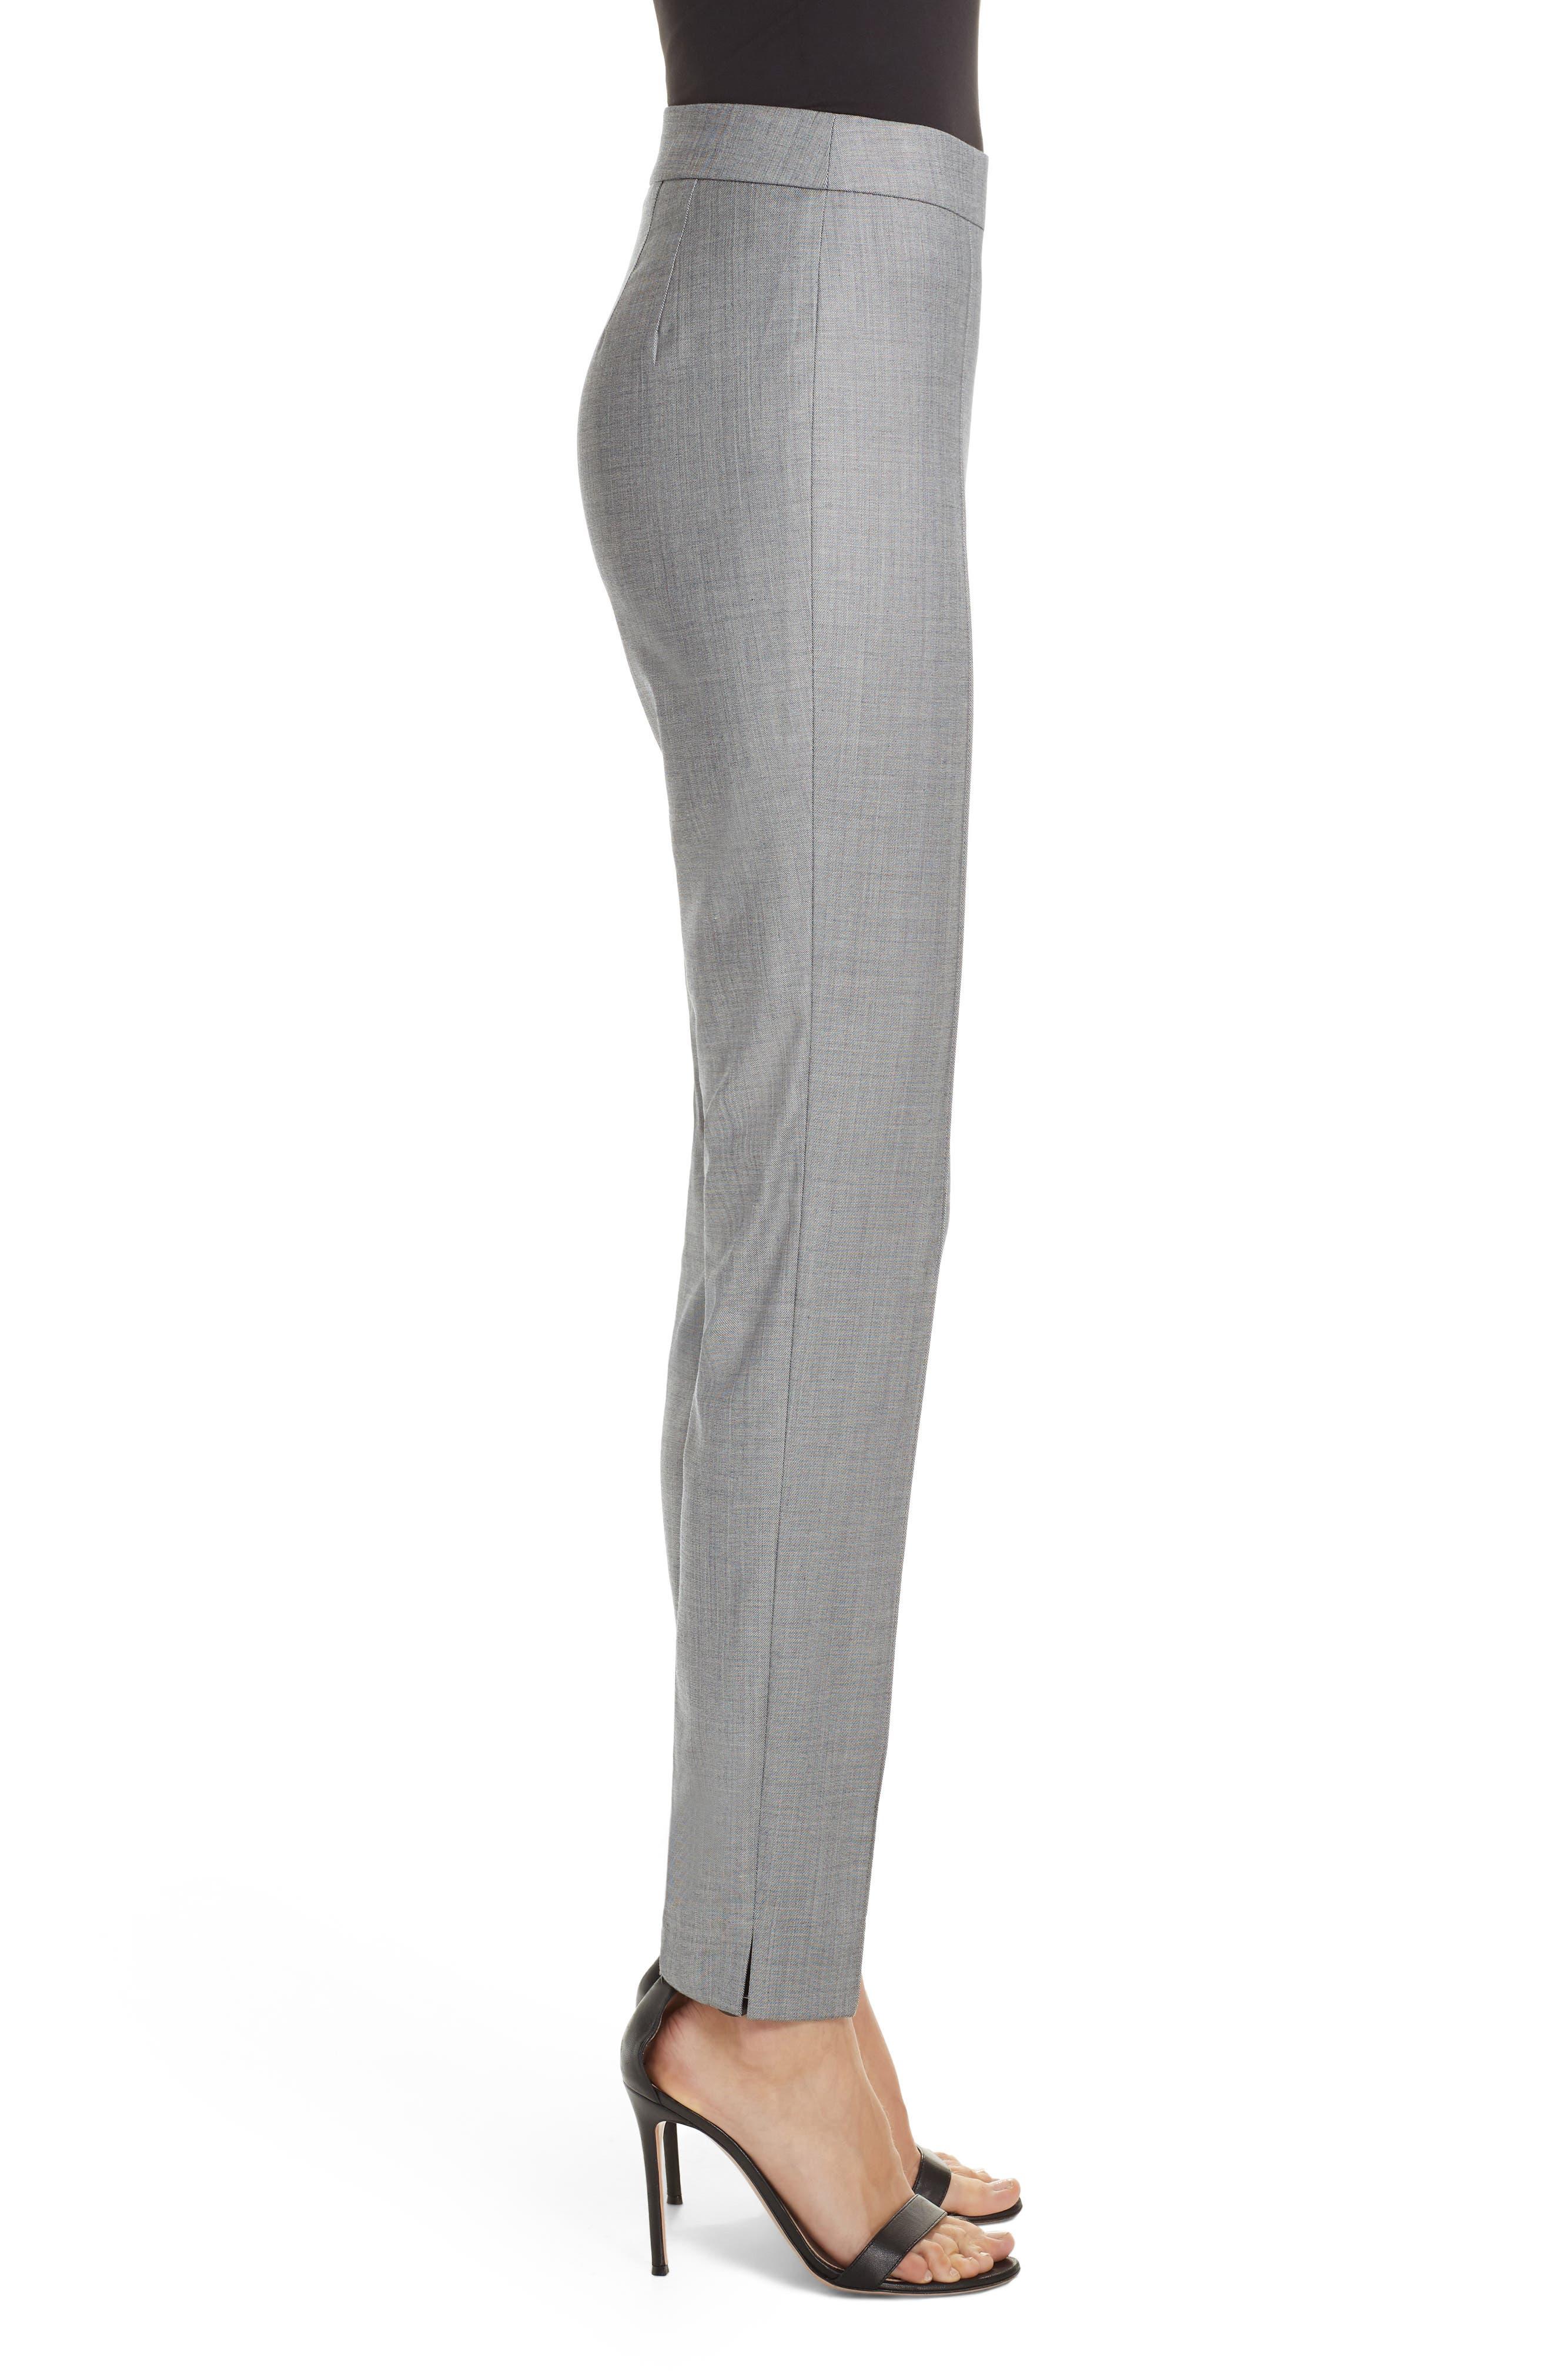 Sharkskin Stretch Wool Blend Skinny Ankle Pants,                             Alternate thumbnail 3, color,                             GREY MULTI